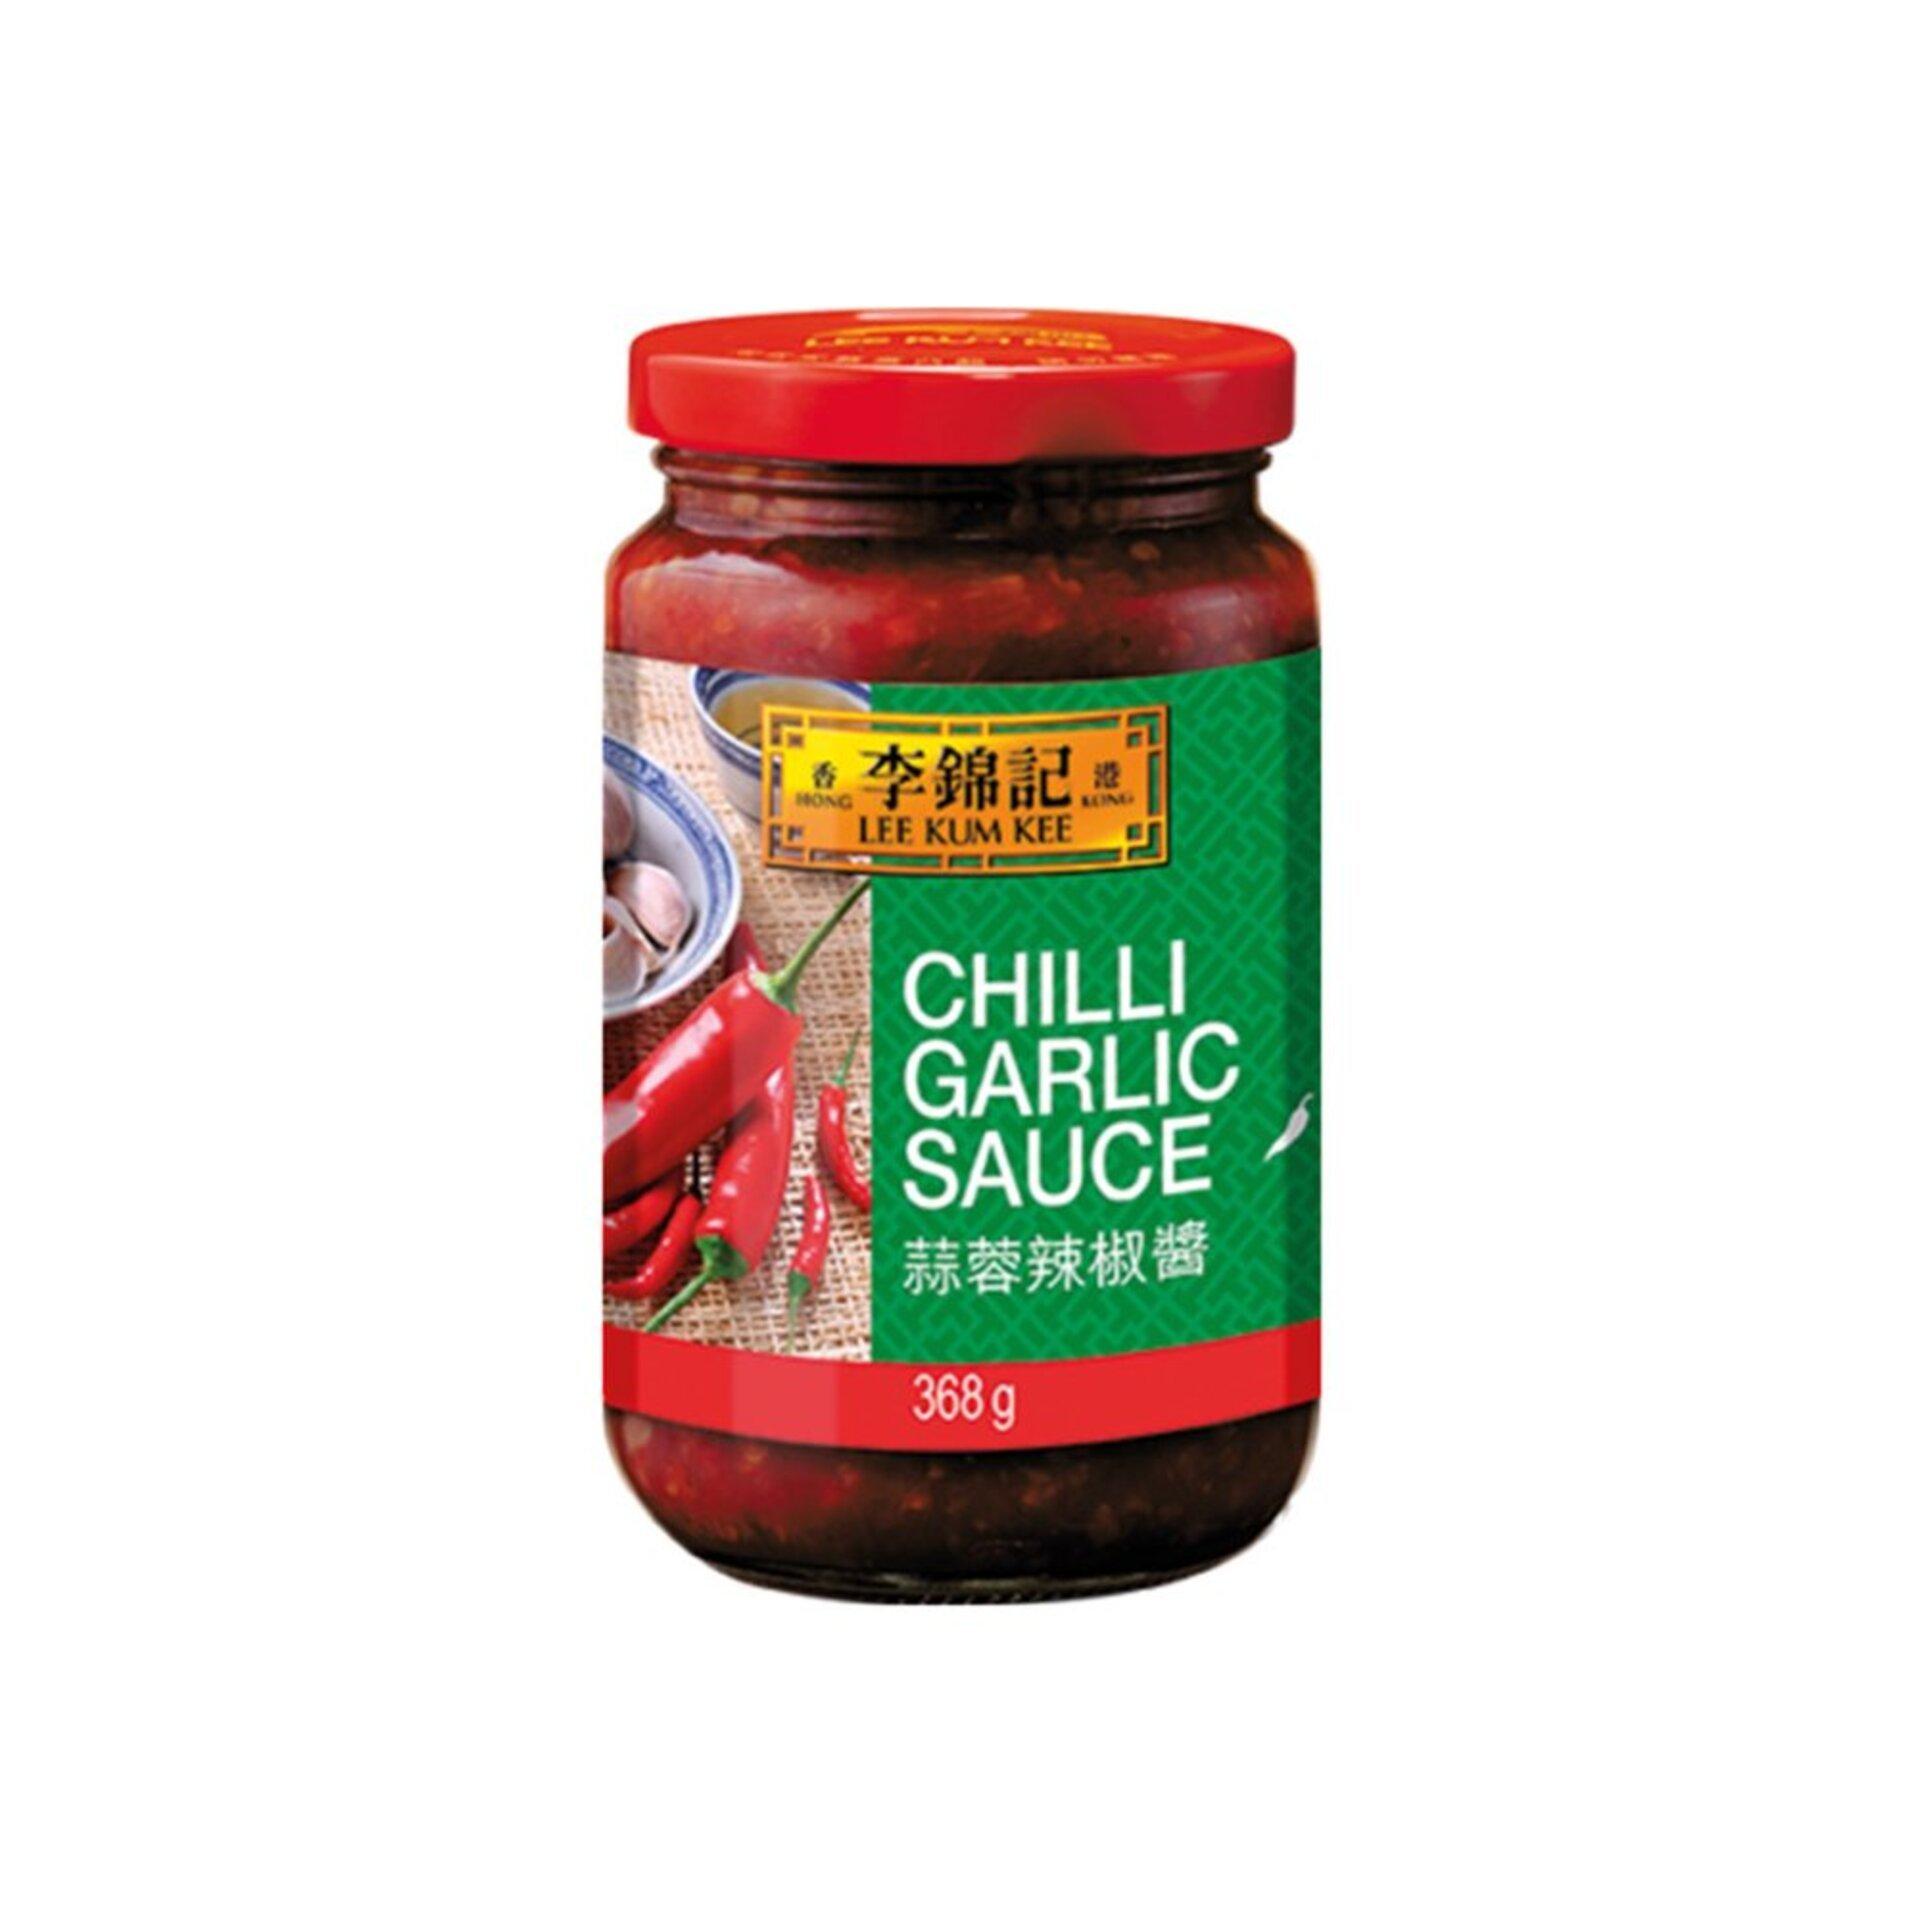 Lee kum kee Chilli omáčka cesnaková 368 g